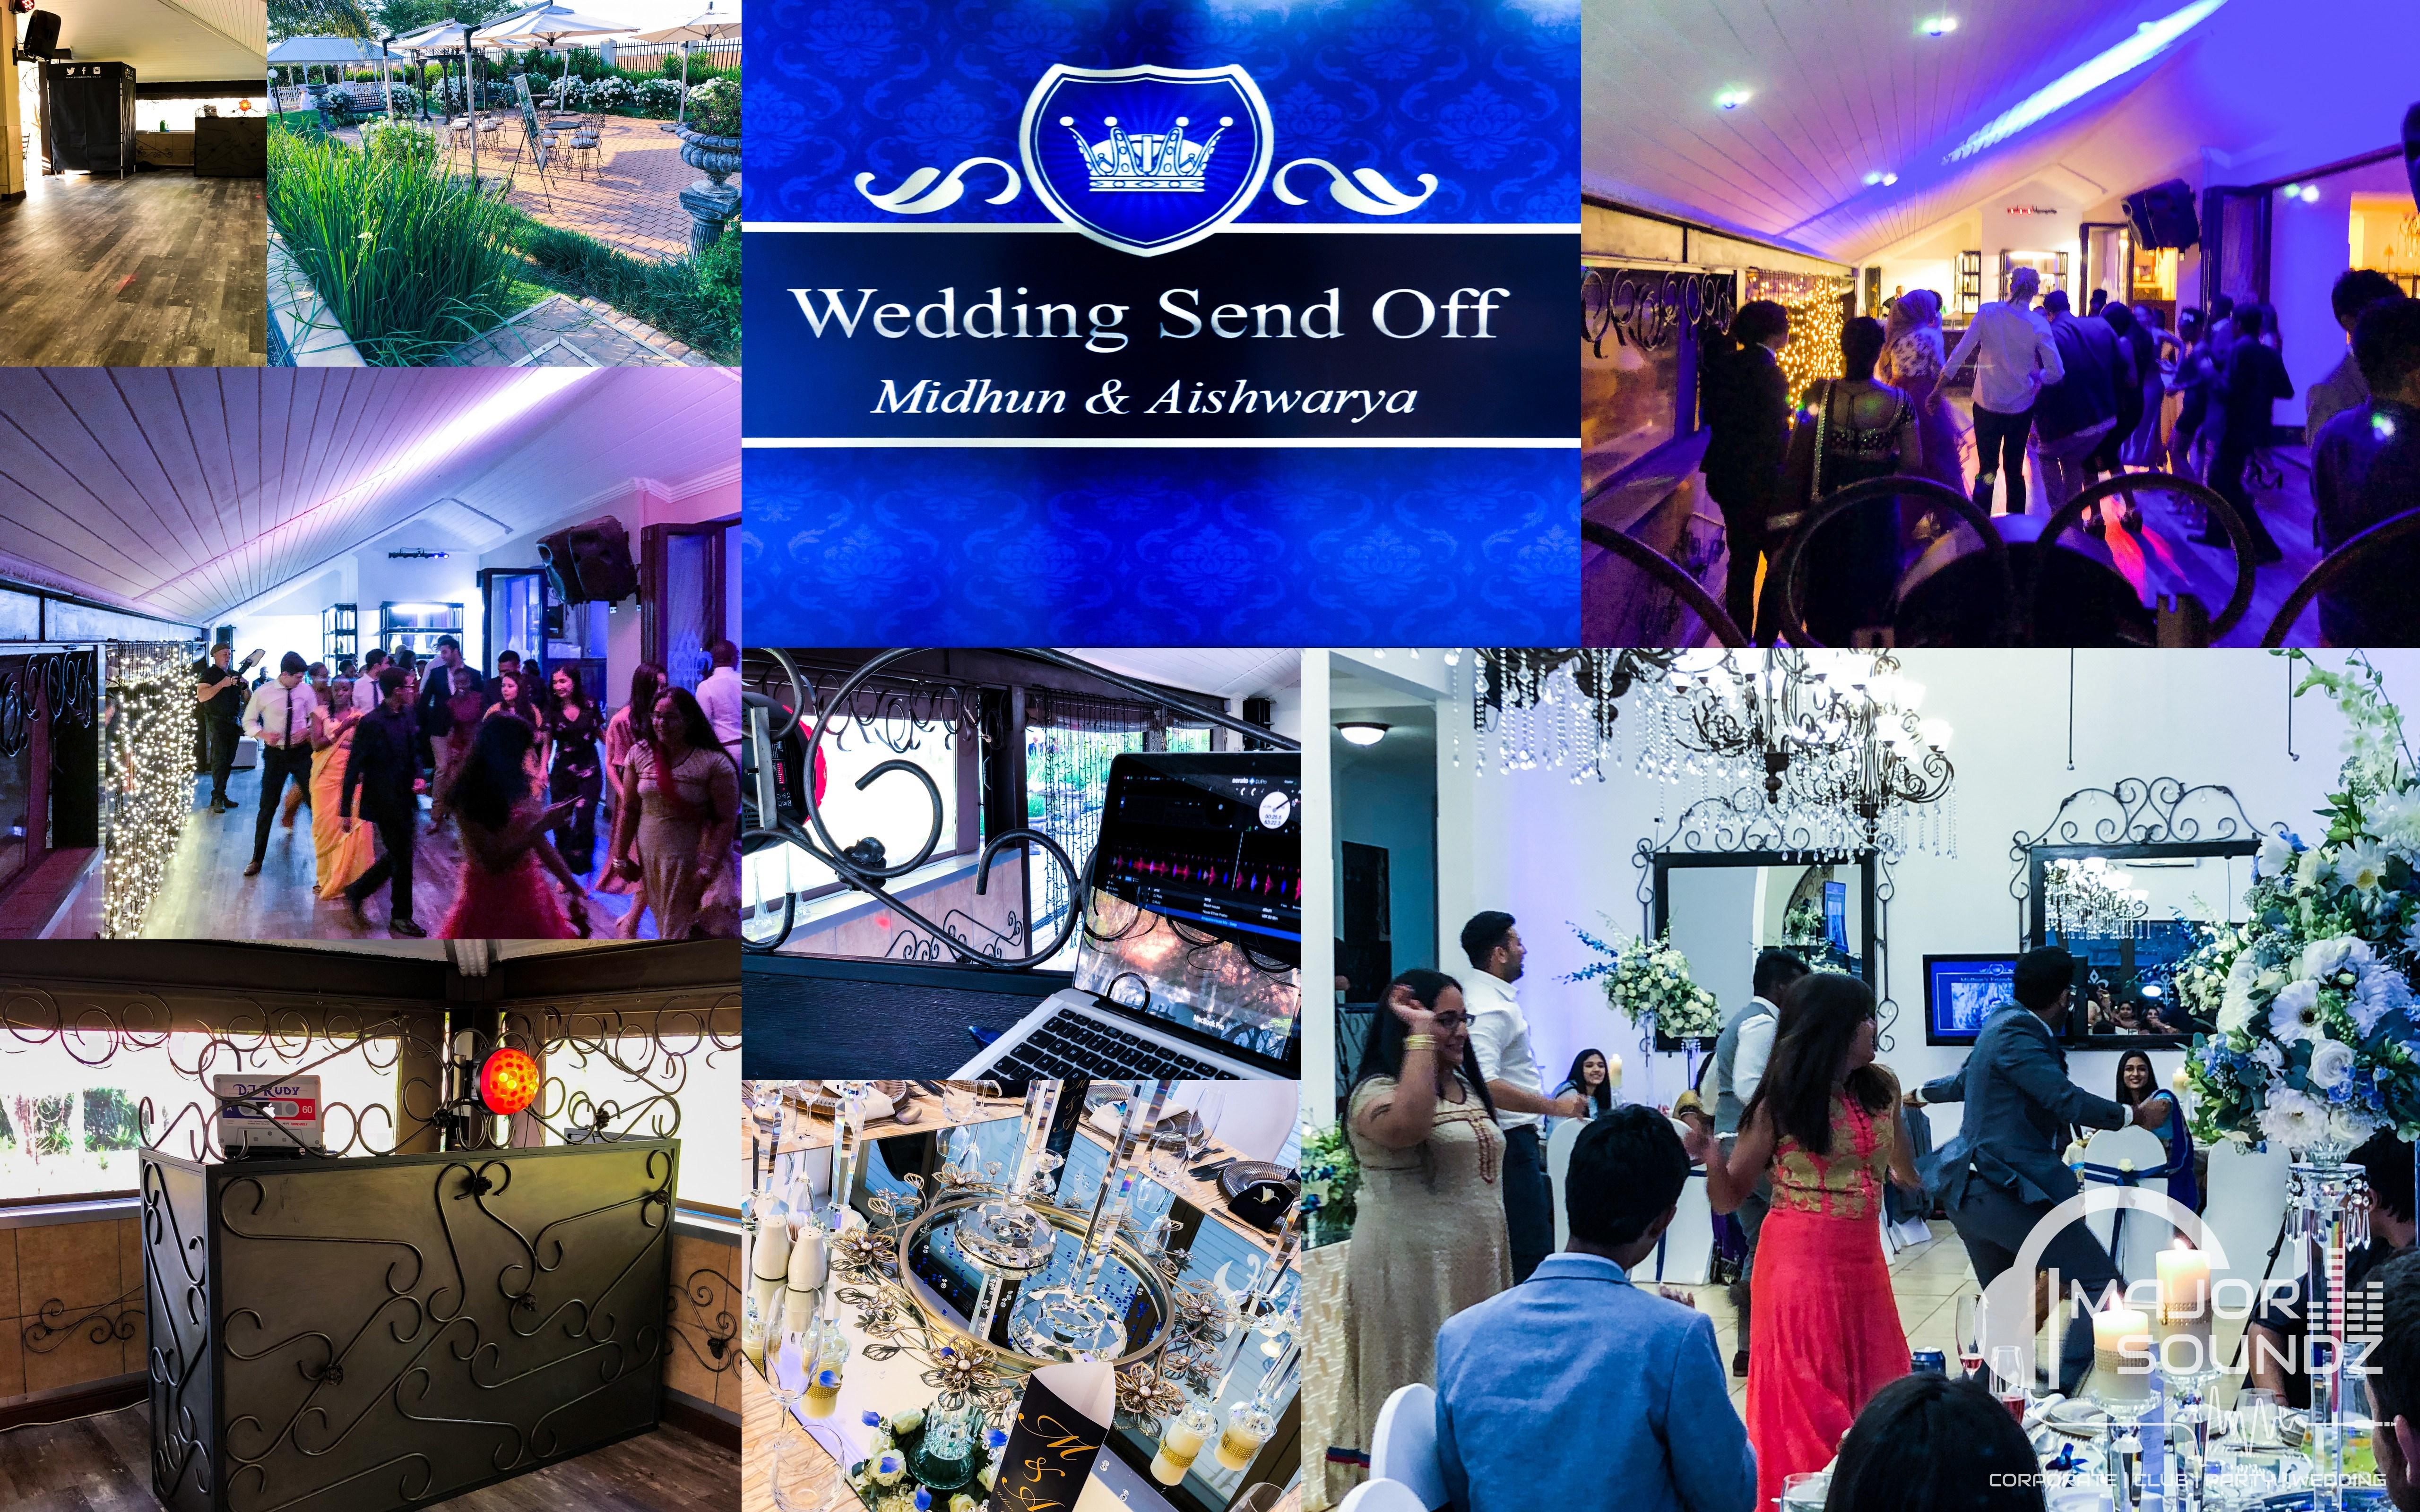 Midhum & Aishwarya Wedding Send Off Party